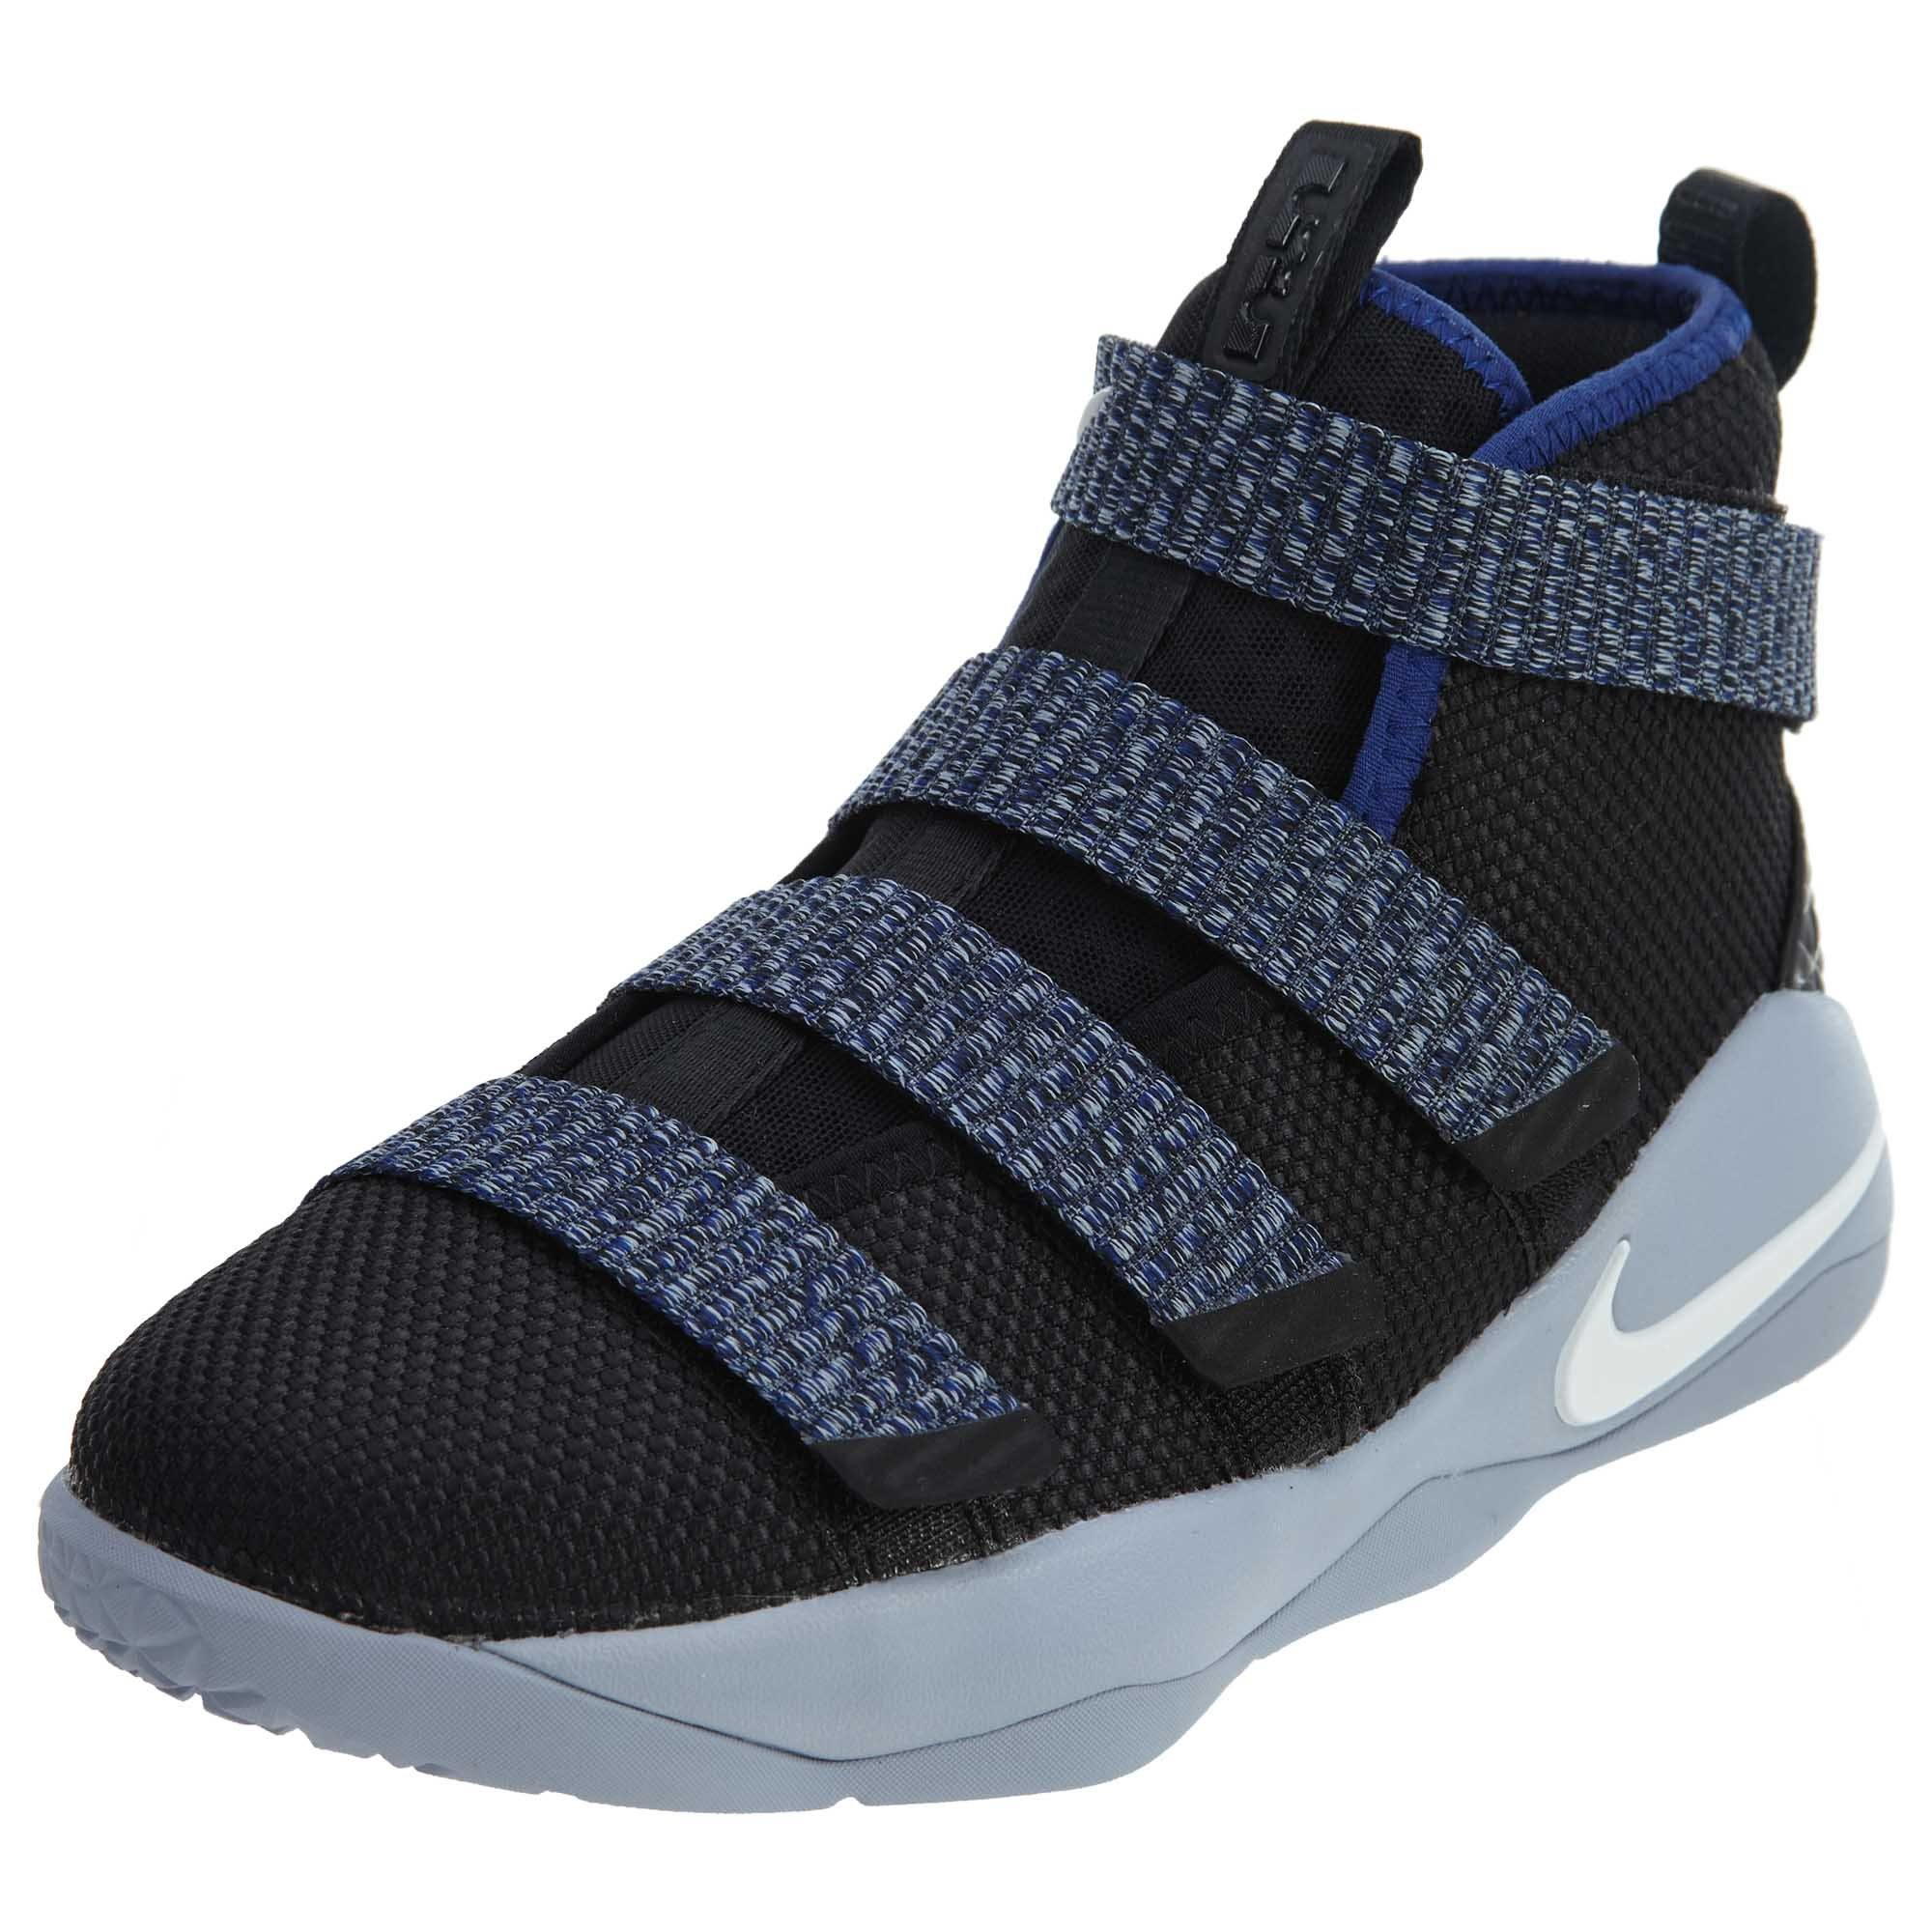 eb991ec657f3 Nike Lebron Soldier Xi Little Kids Style  918368-005 Size  2.5 Y US ...